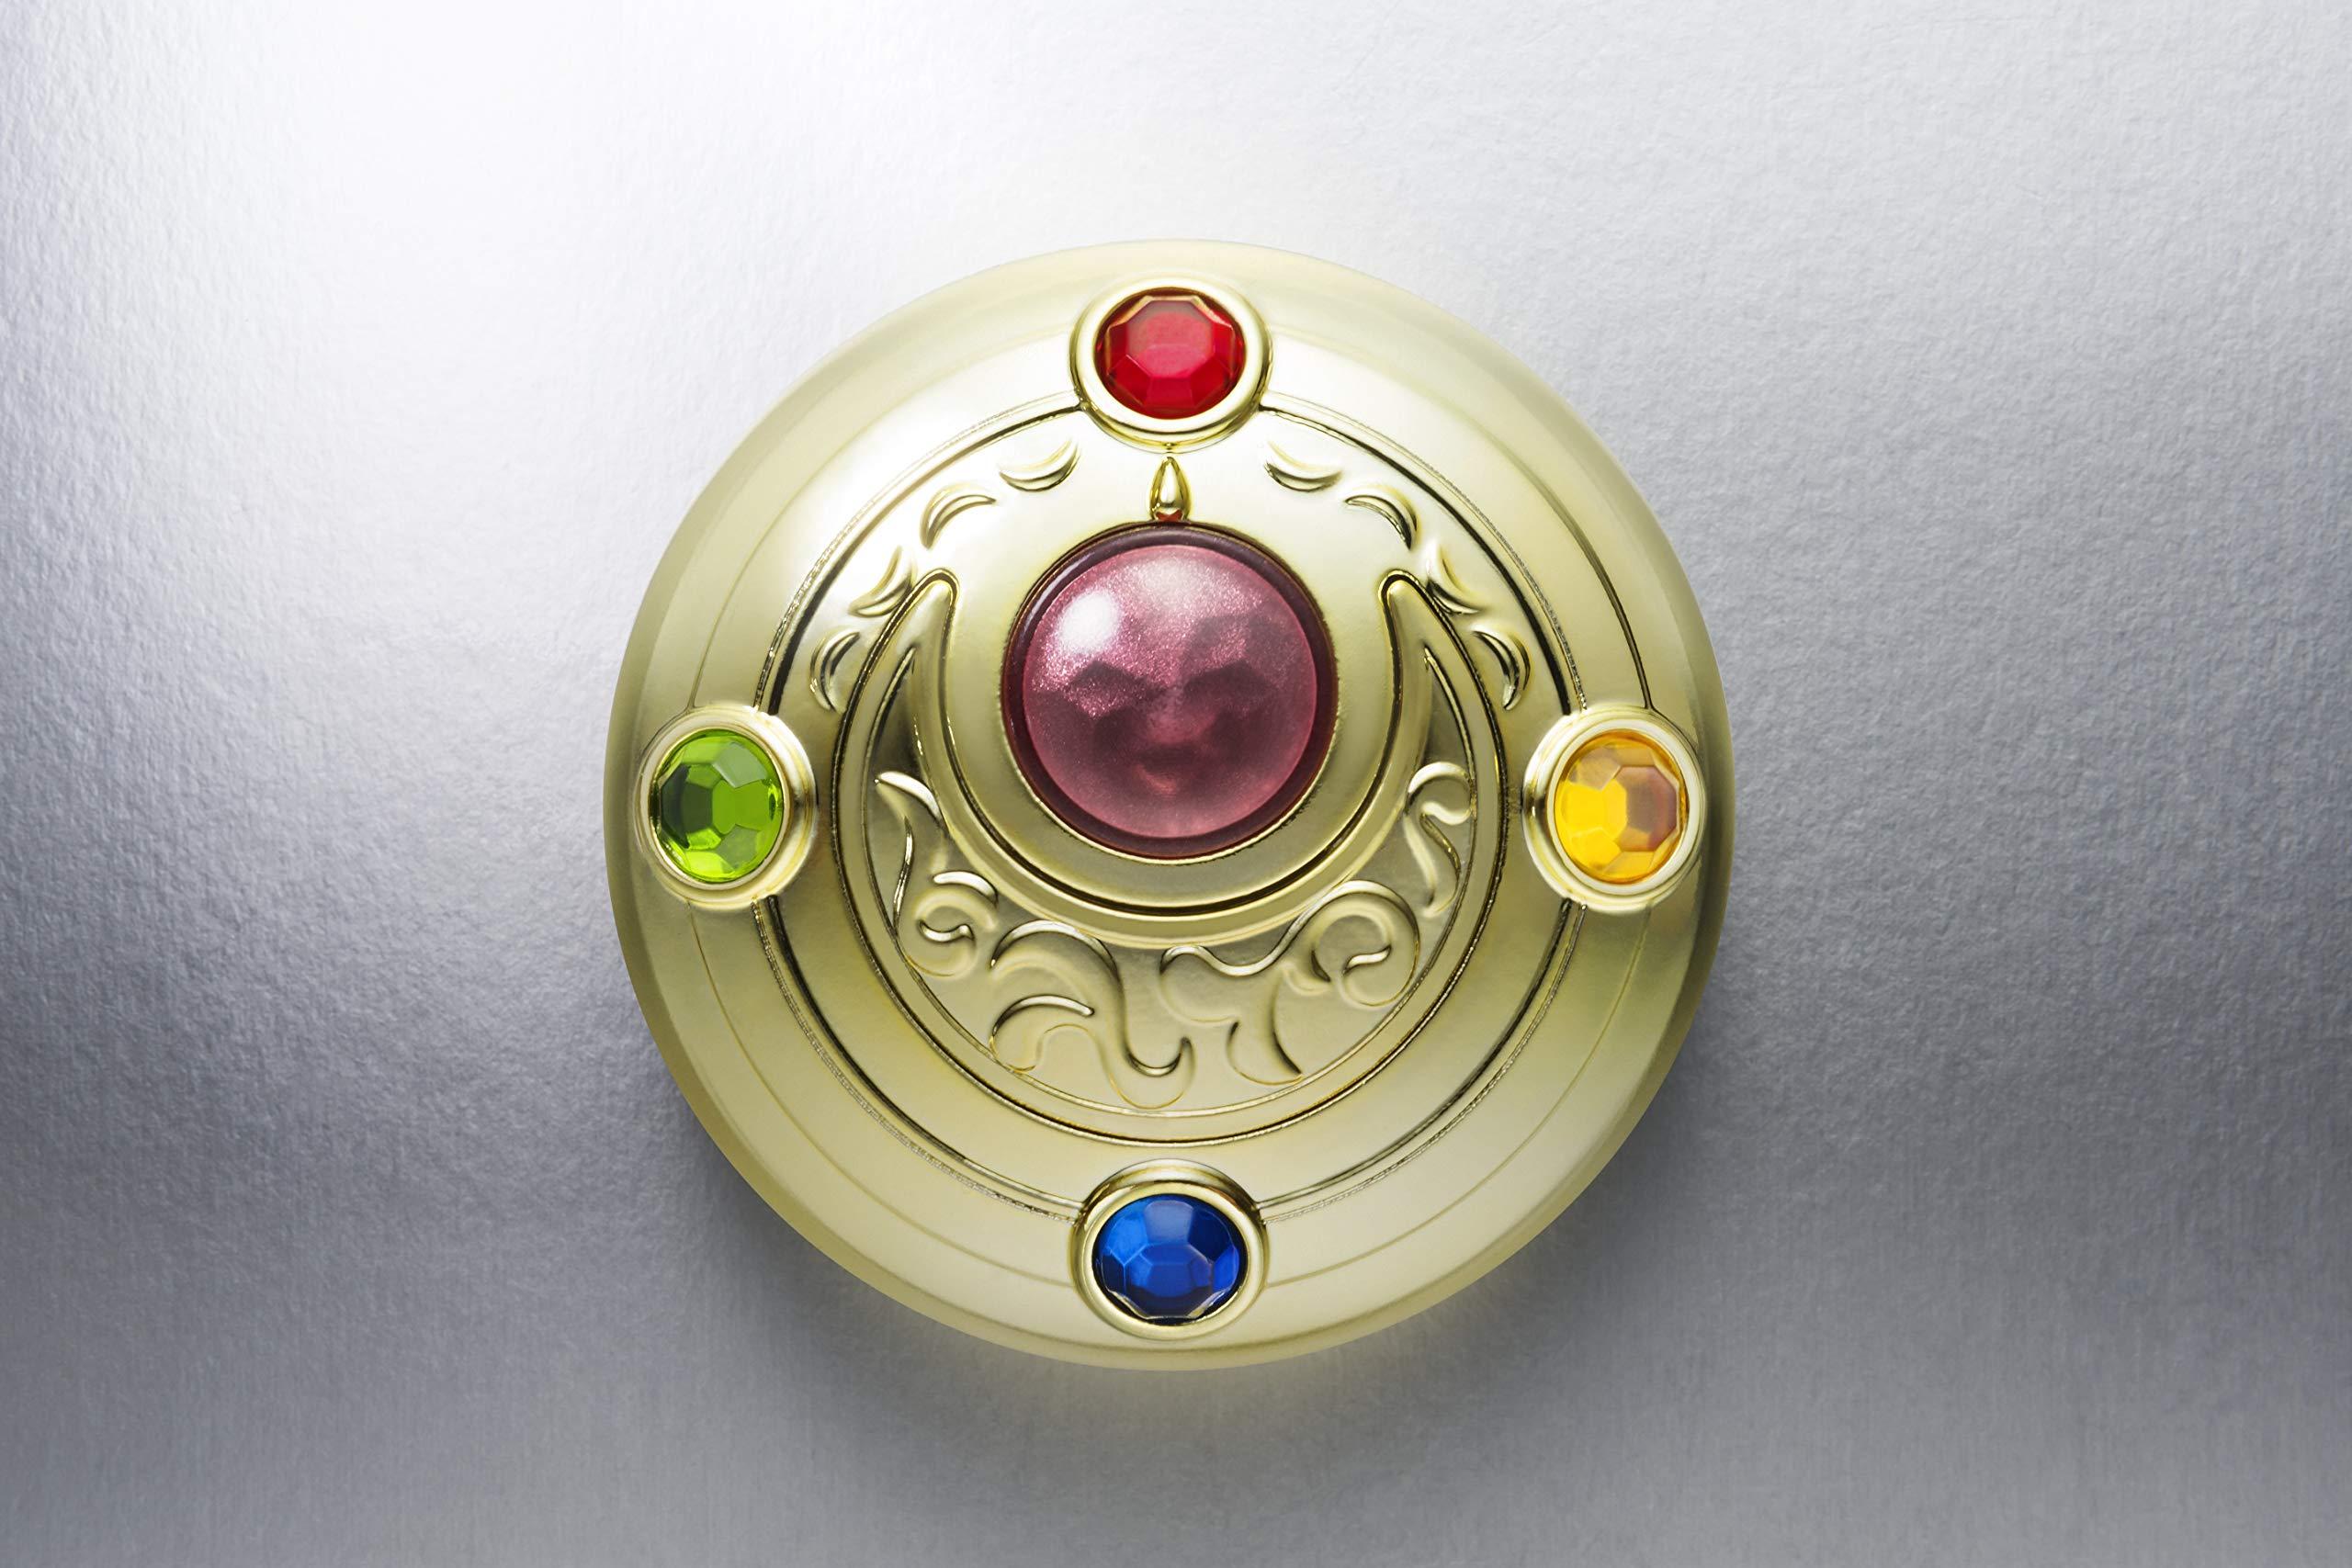 Bandai Tamashii Nations Proplica Transformation Brooch & Disguise Pen Set ''Sailor Moon'' Statue by Tamashii Nations (Image #13)